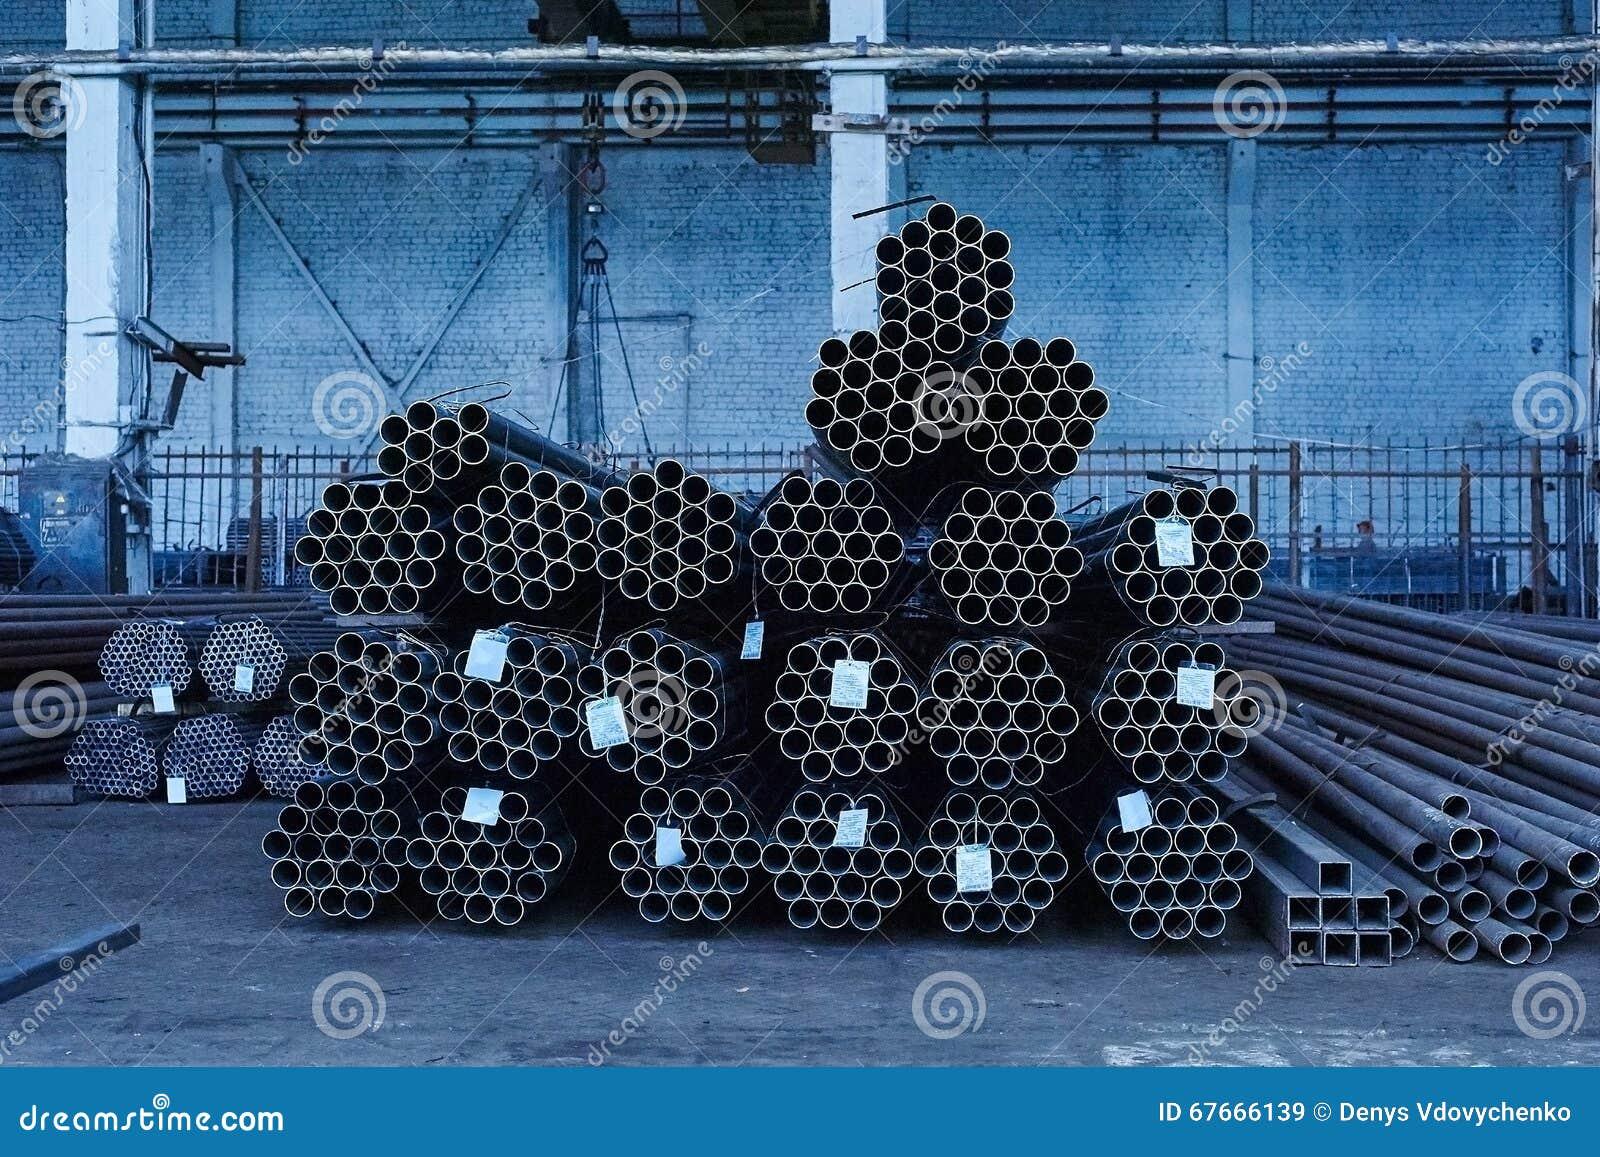 odm steel round stock